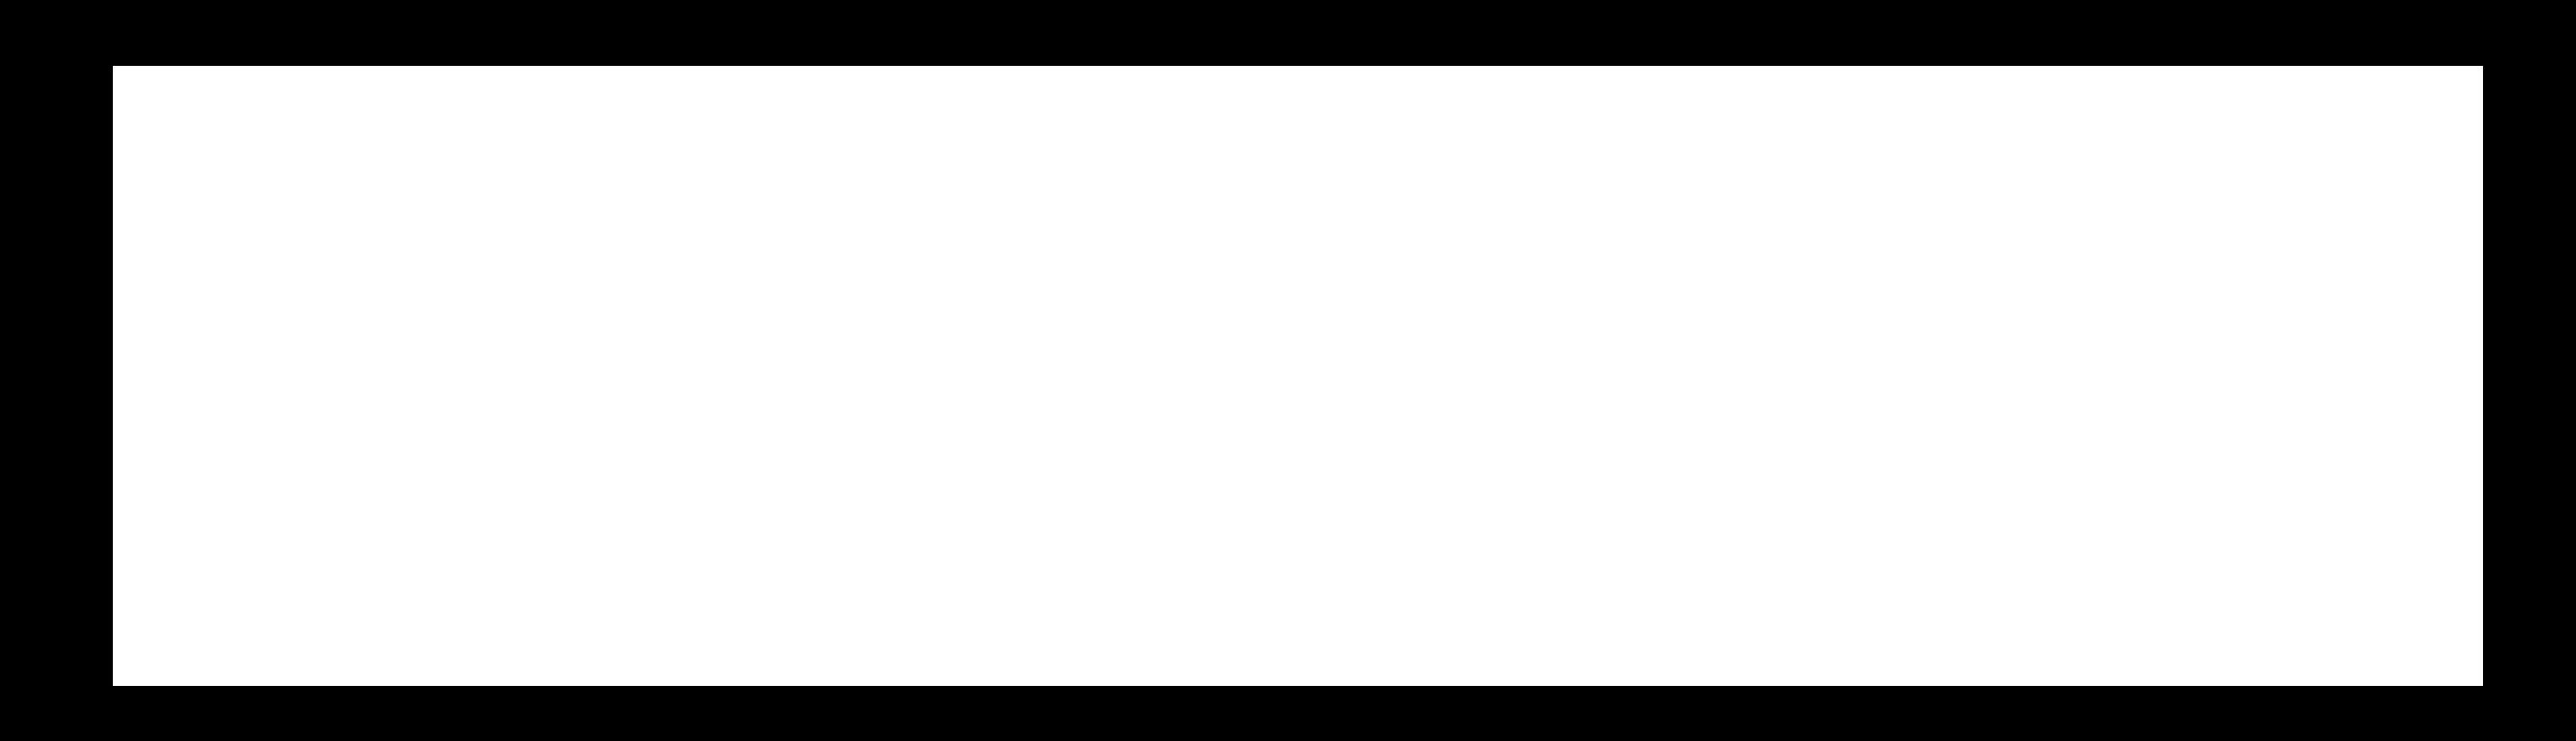 Providing NHS service logo 2020